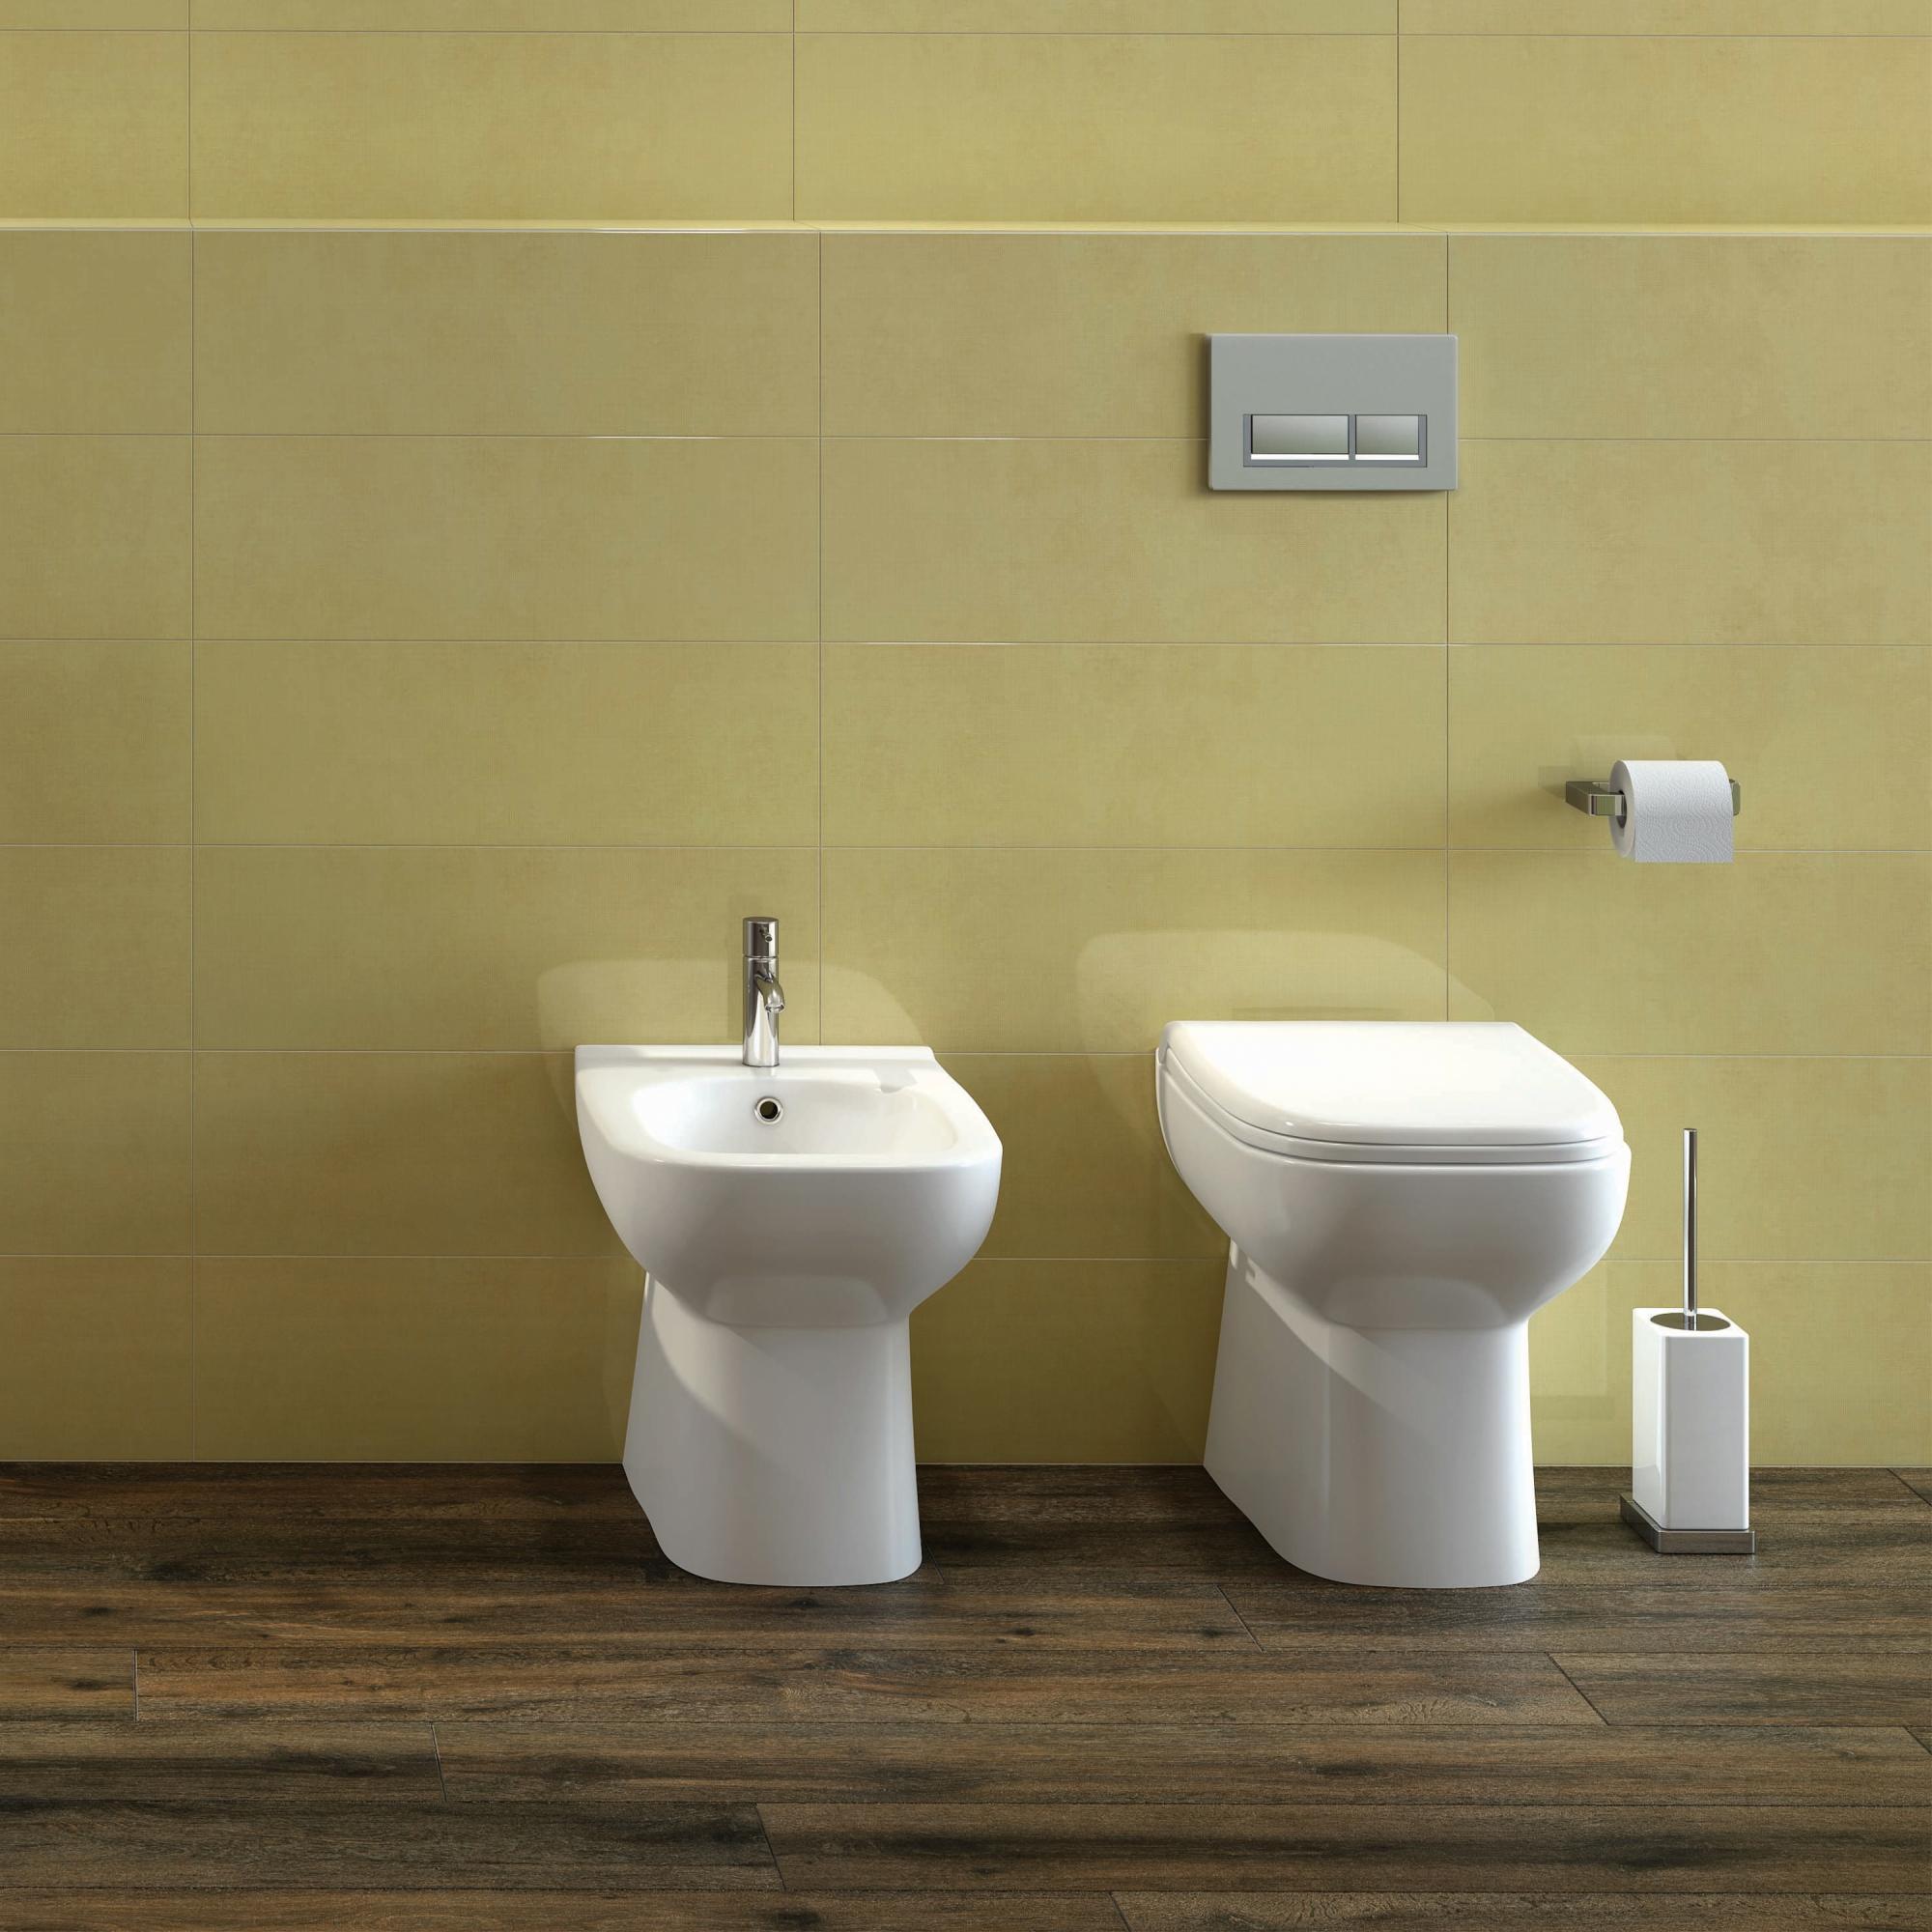 RAK Origin Back to Wall Toilet 500mm Projection - Soft Close Seat